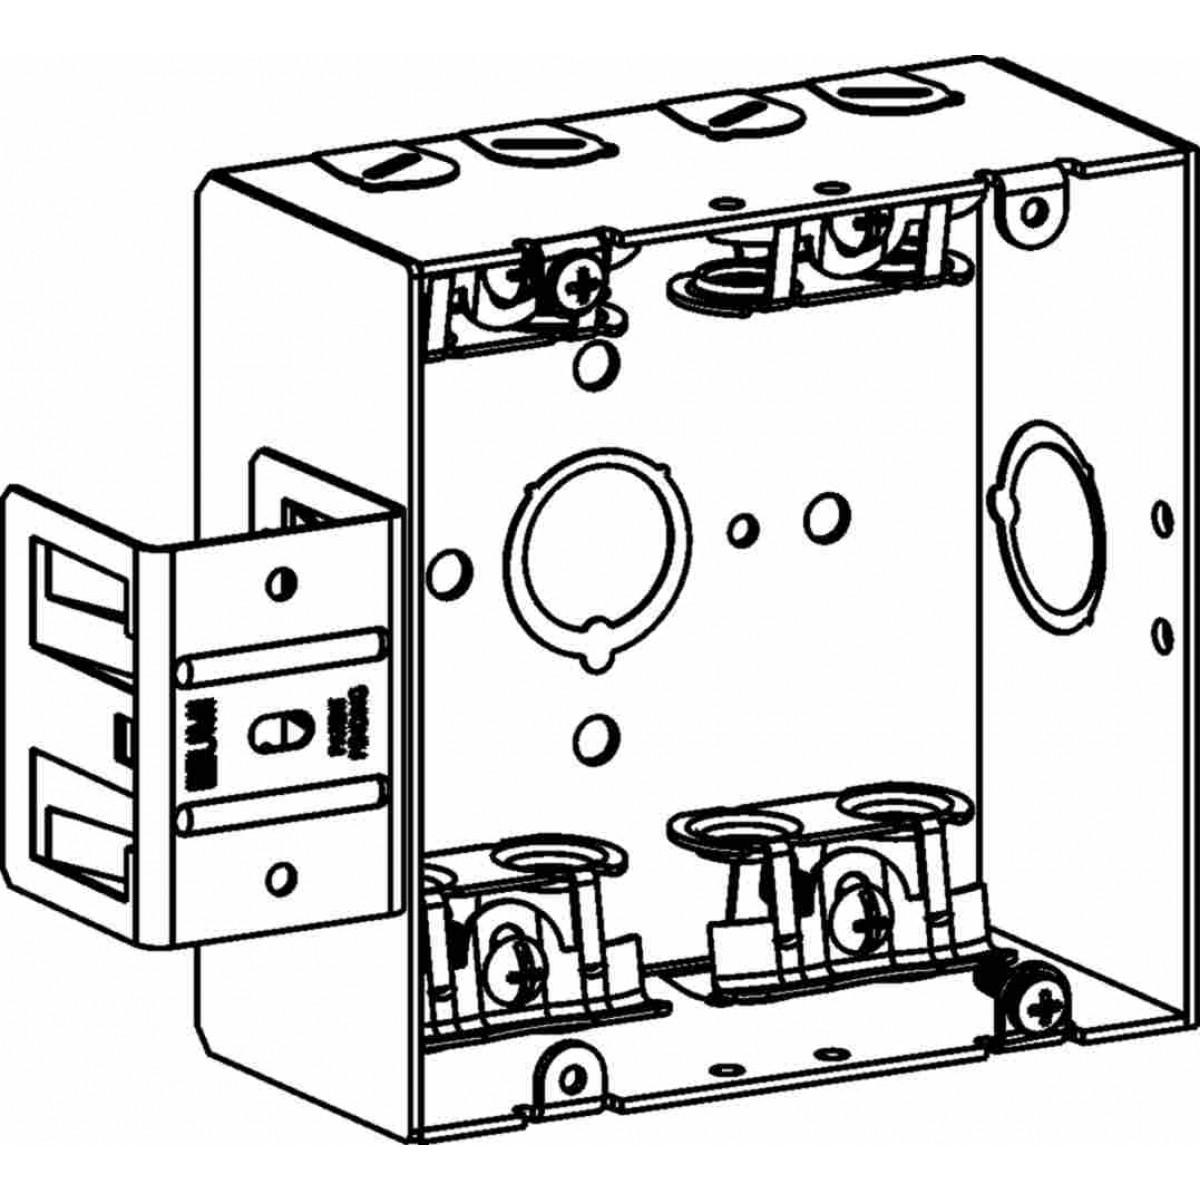 5sdb-mc2-ms - 4-11  16 u201d  5s  boxes